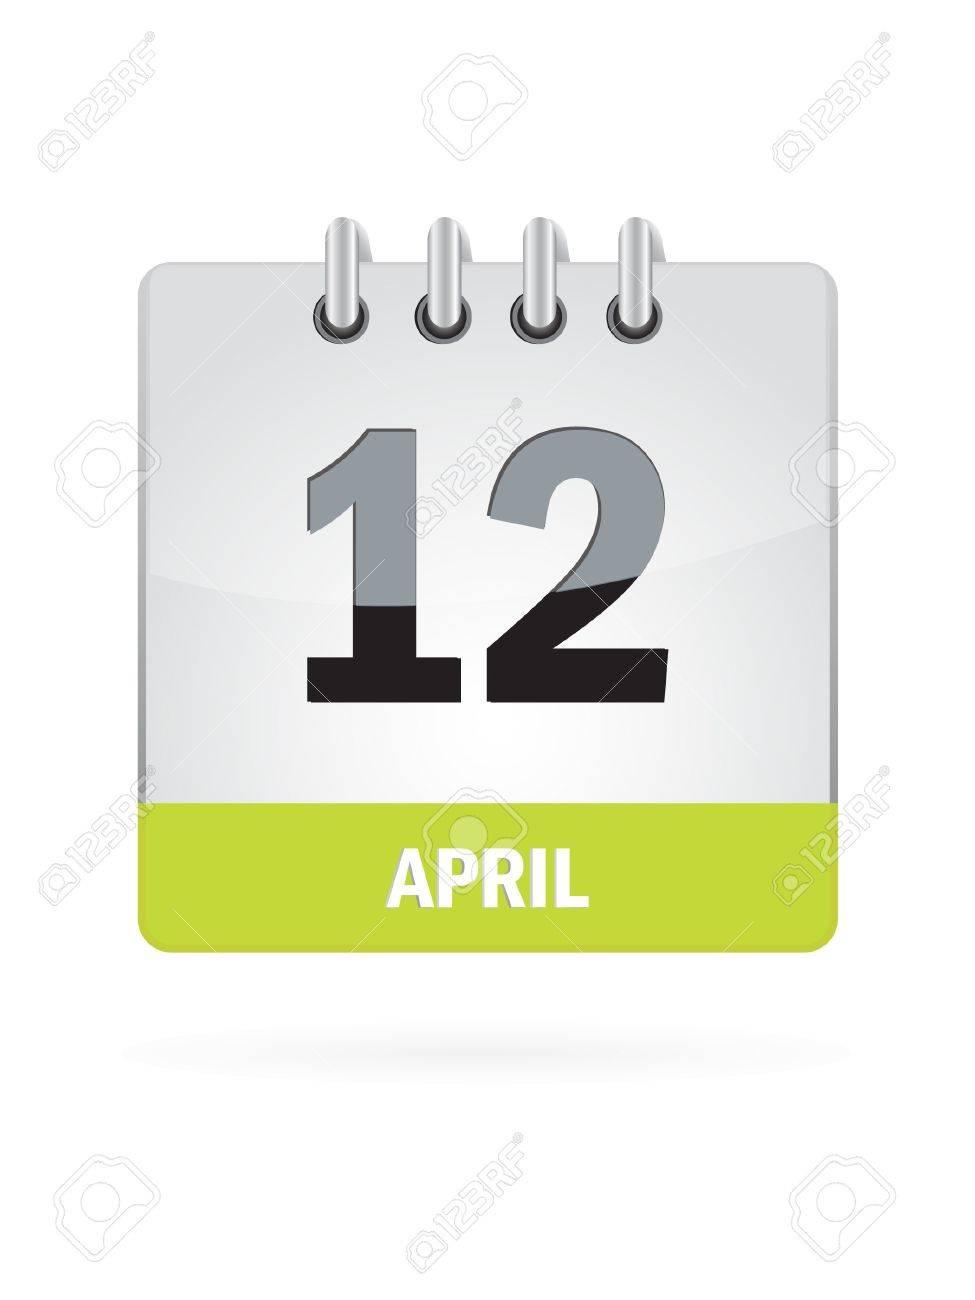 12 April Calendar Icon On White Background Stock Vector - 17882815